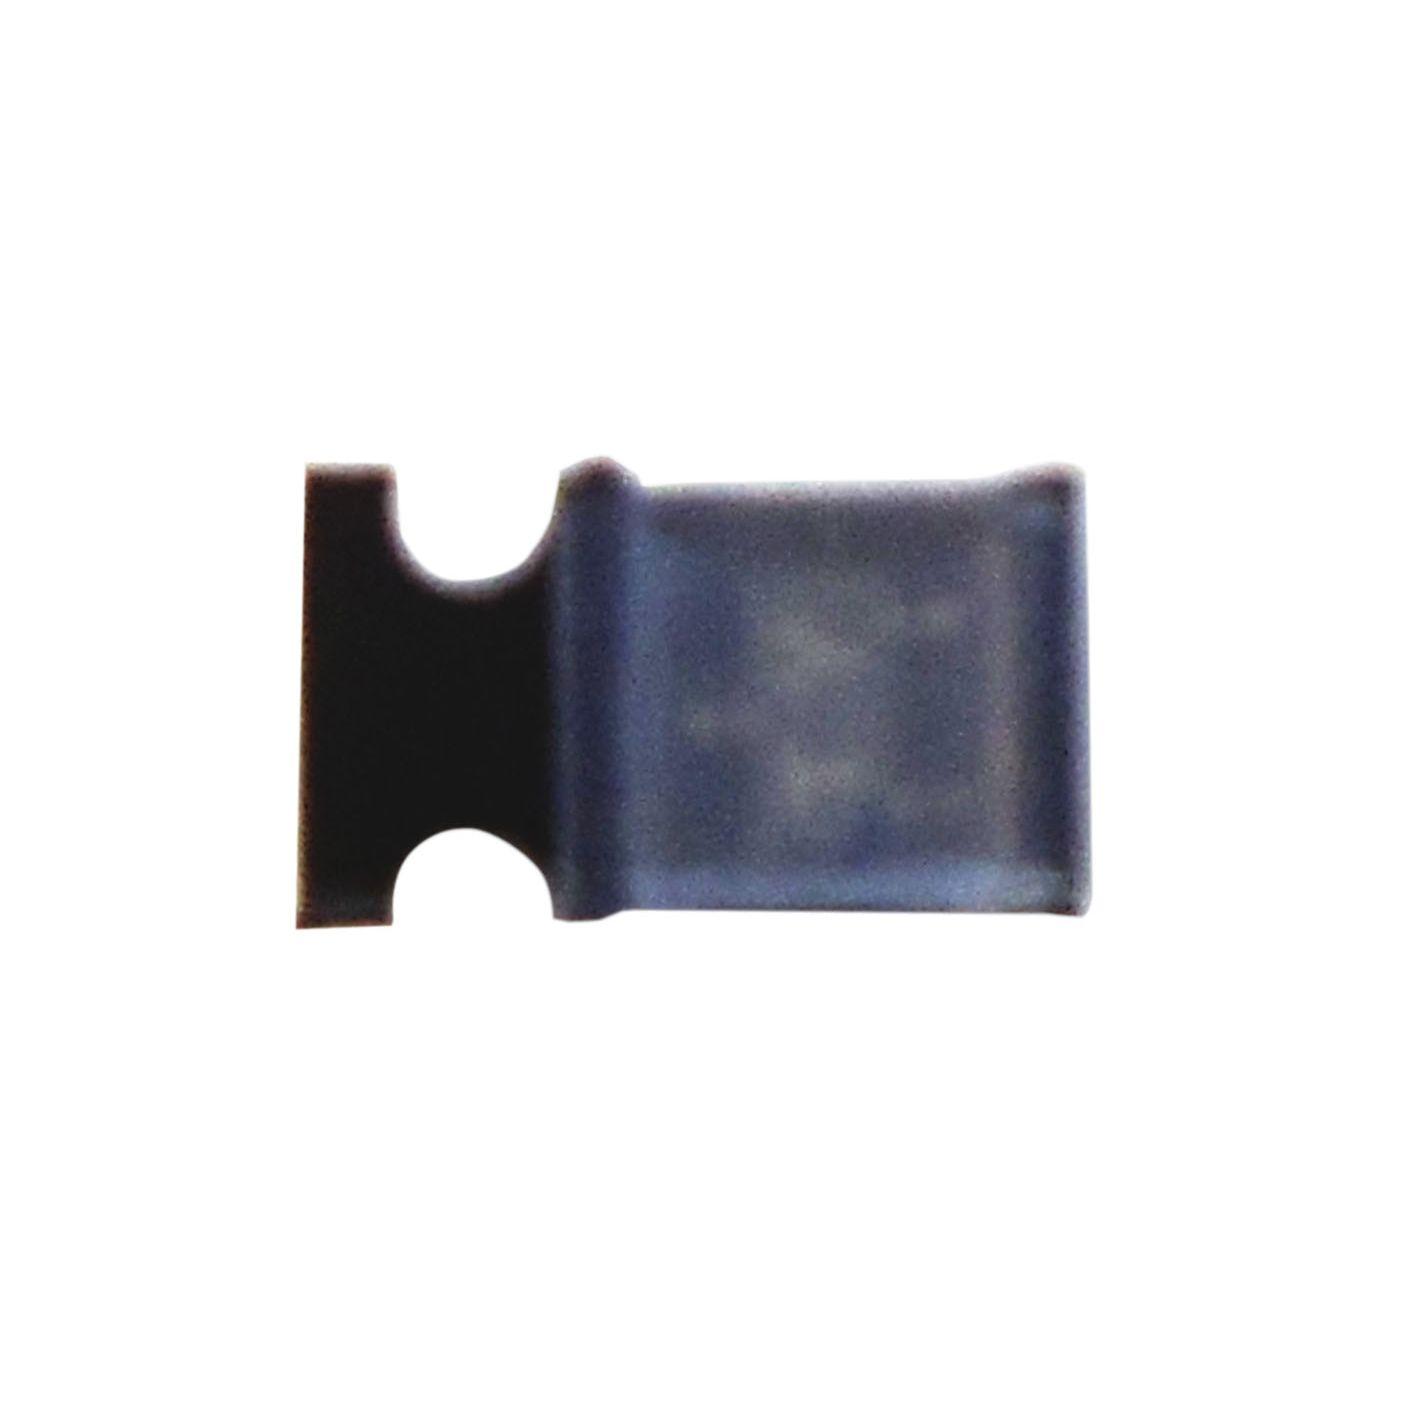 BDCB0302124 - Uniden Bearcat Integrated Circuit 2SK302-4